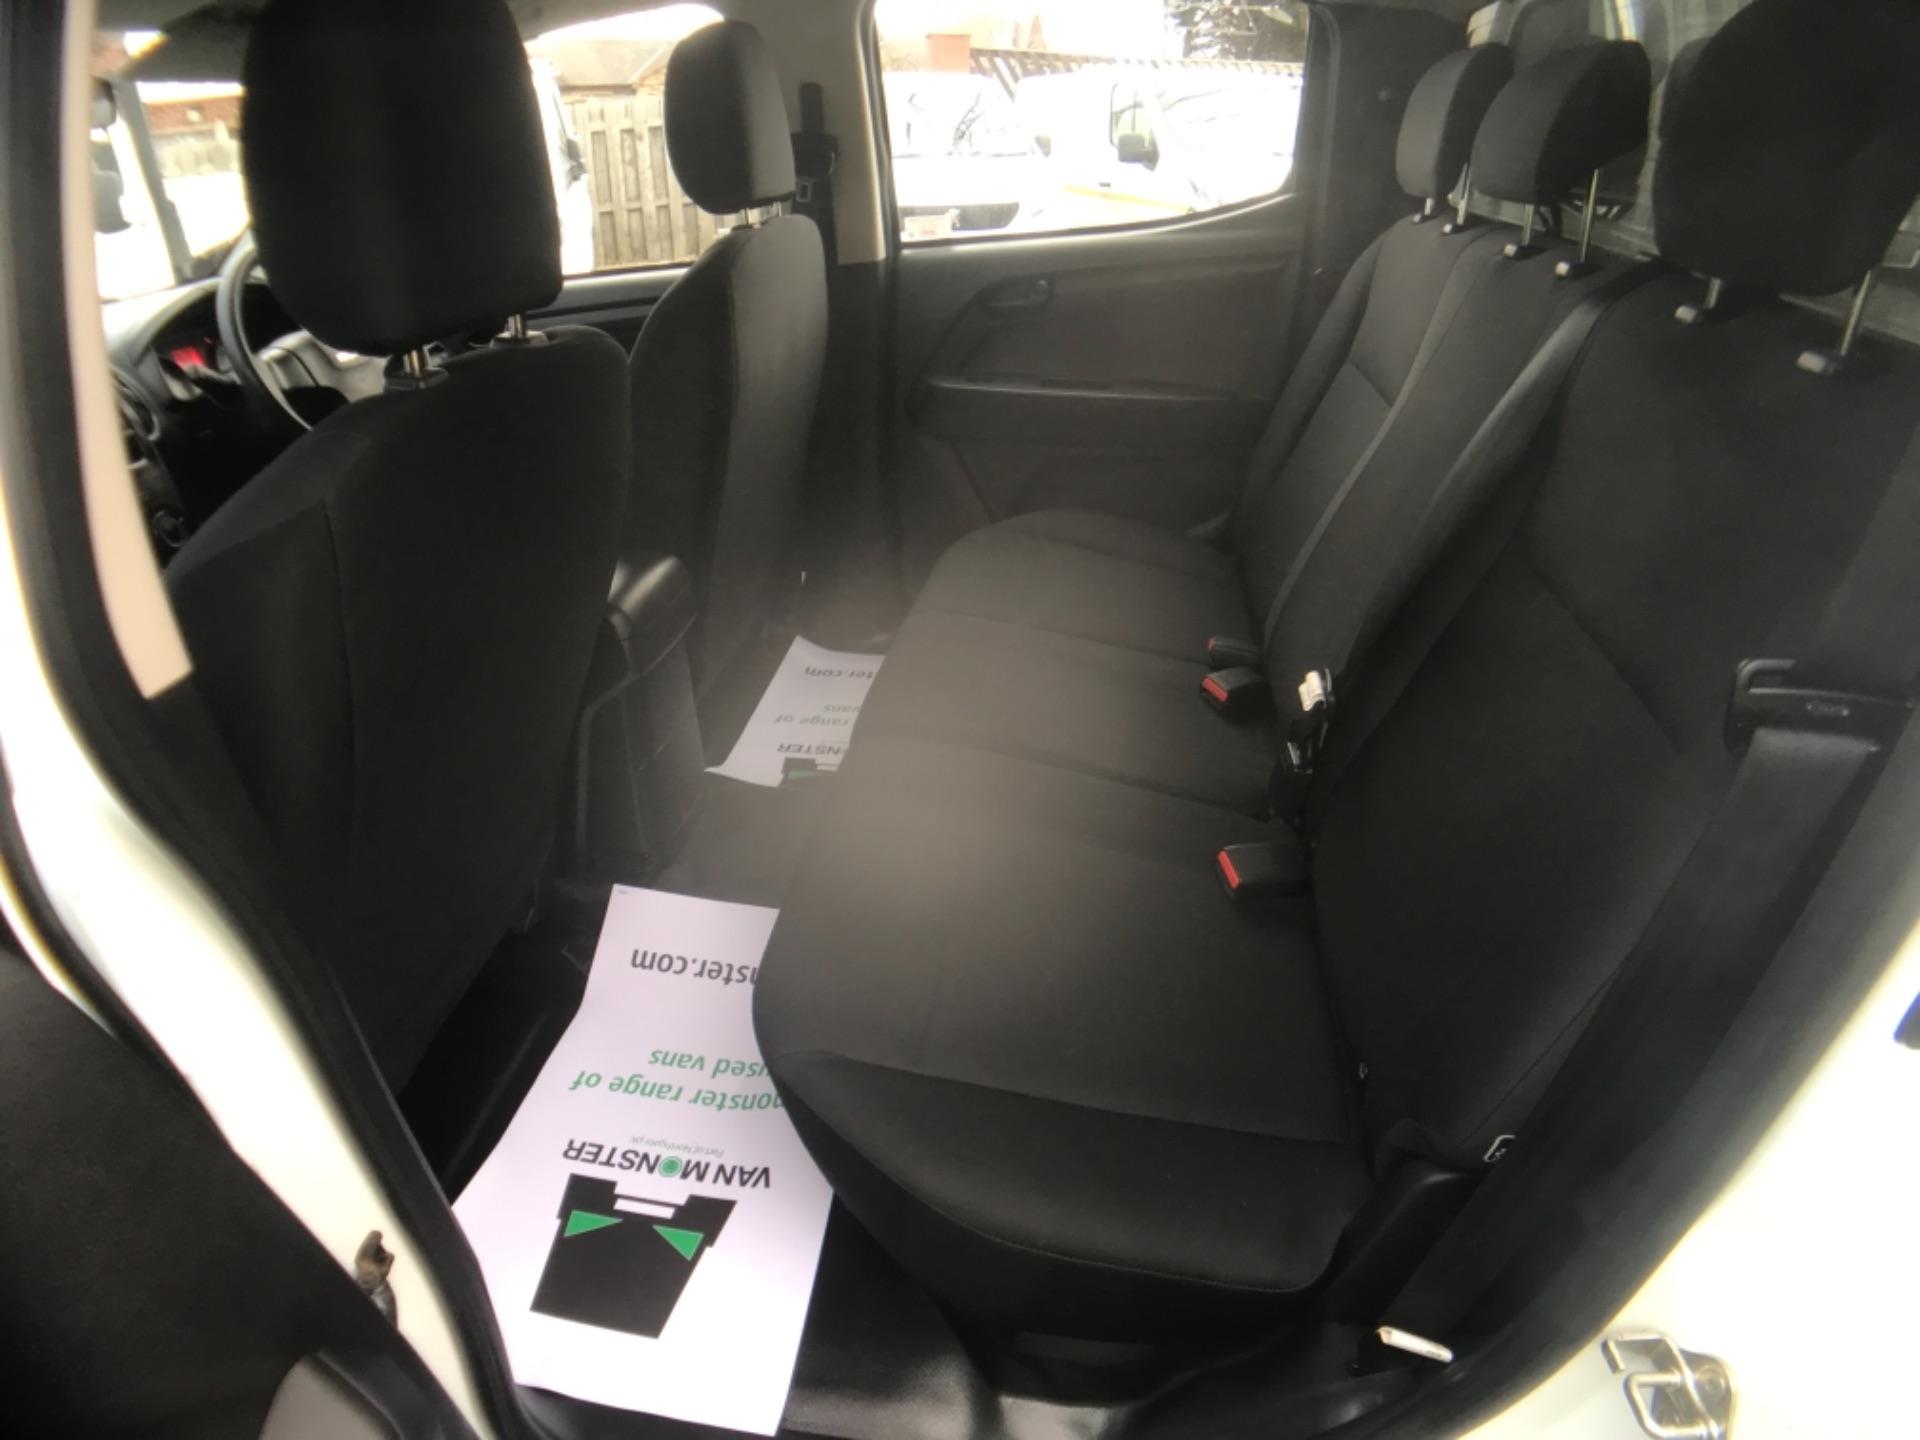 2018 Isuzu D-Max 1.9 Double Cab 4X4 (YG18FZJ) Image 10